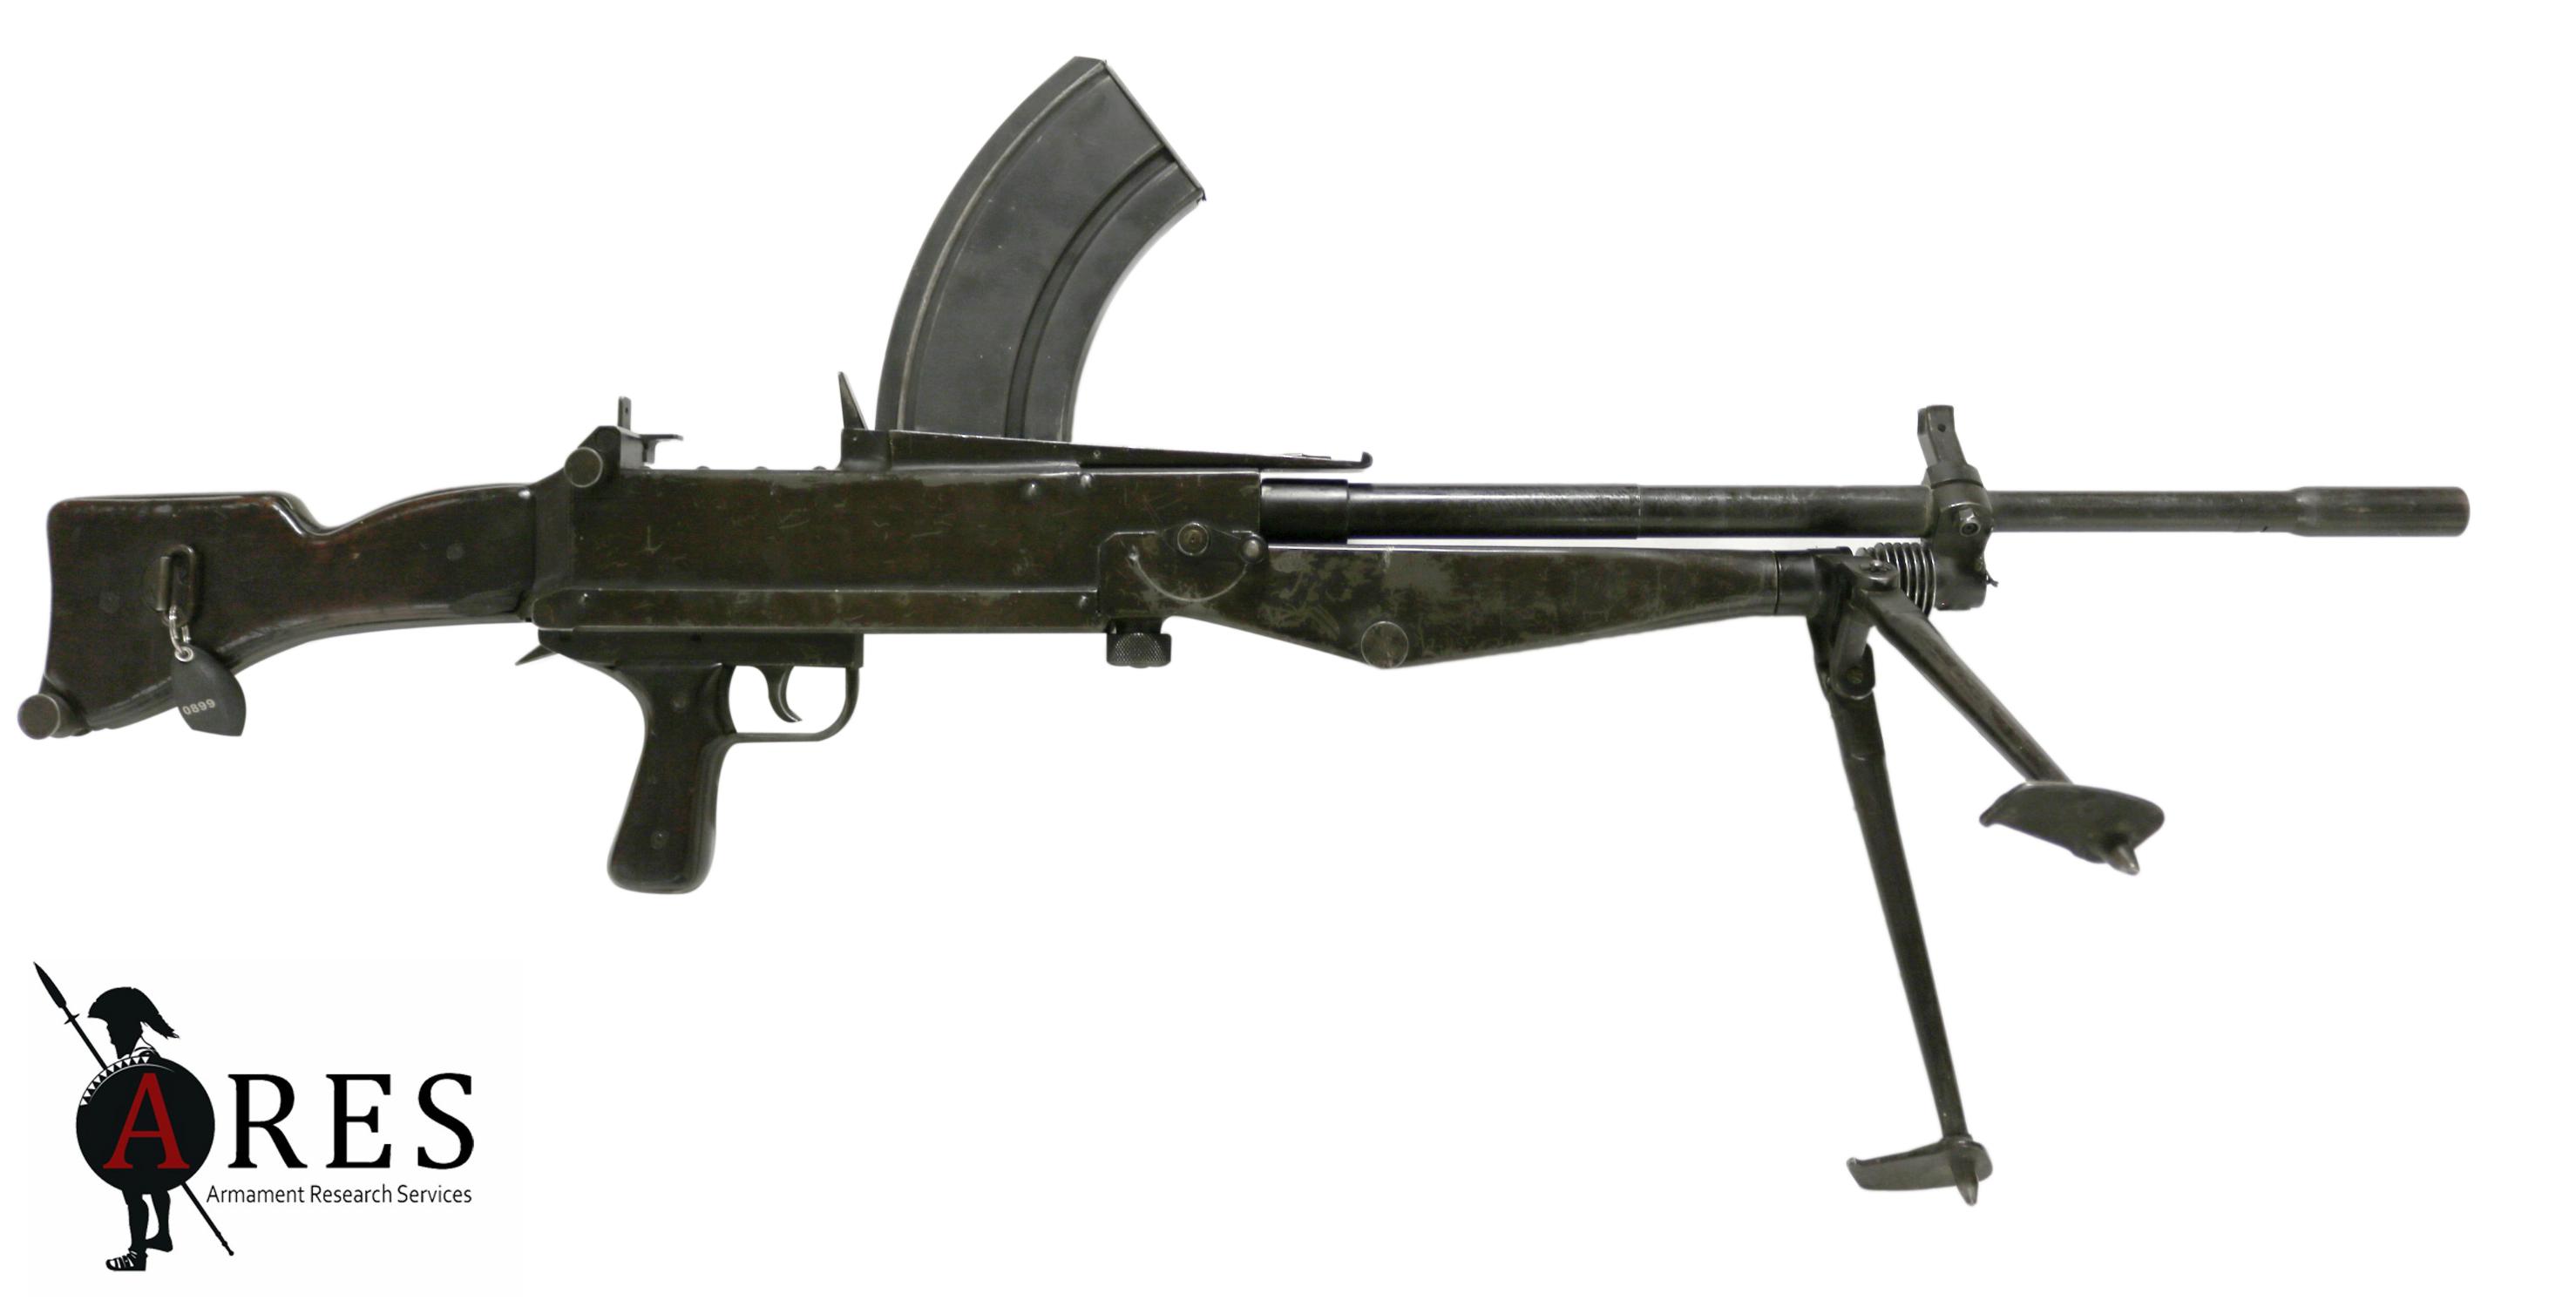 British Besal (Faulkner) light machine gun – Armament Research Services